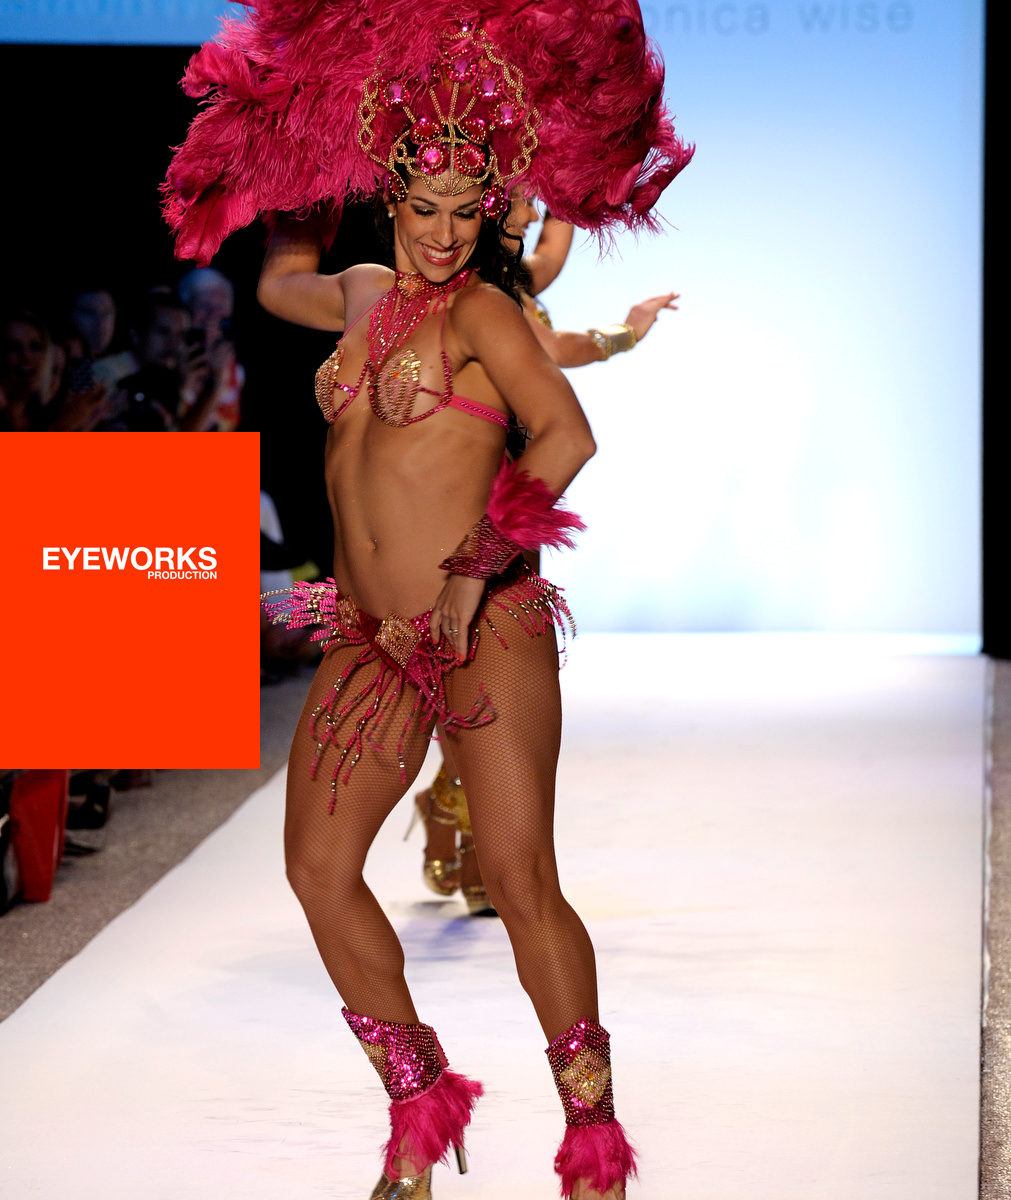 Fashion Runway Event Photographer, Miami, Florida.